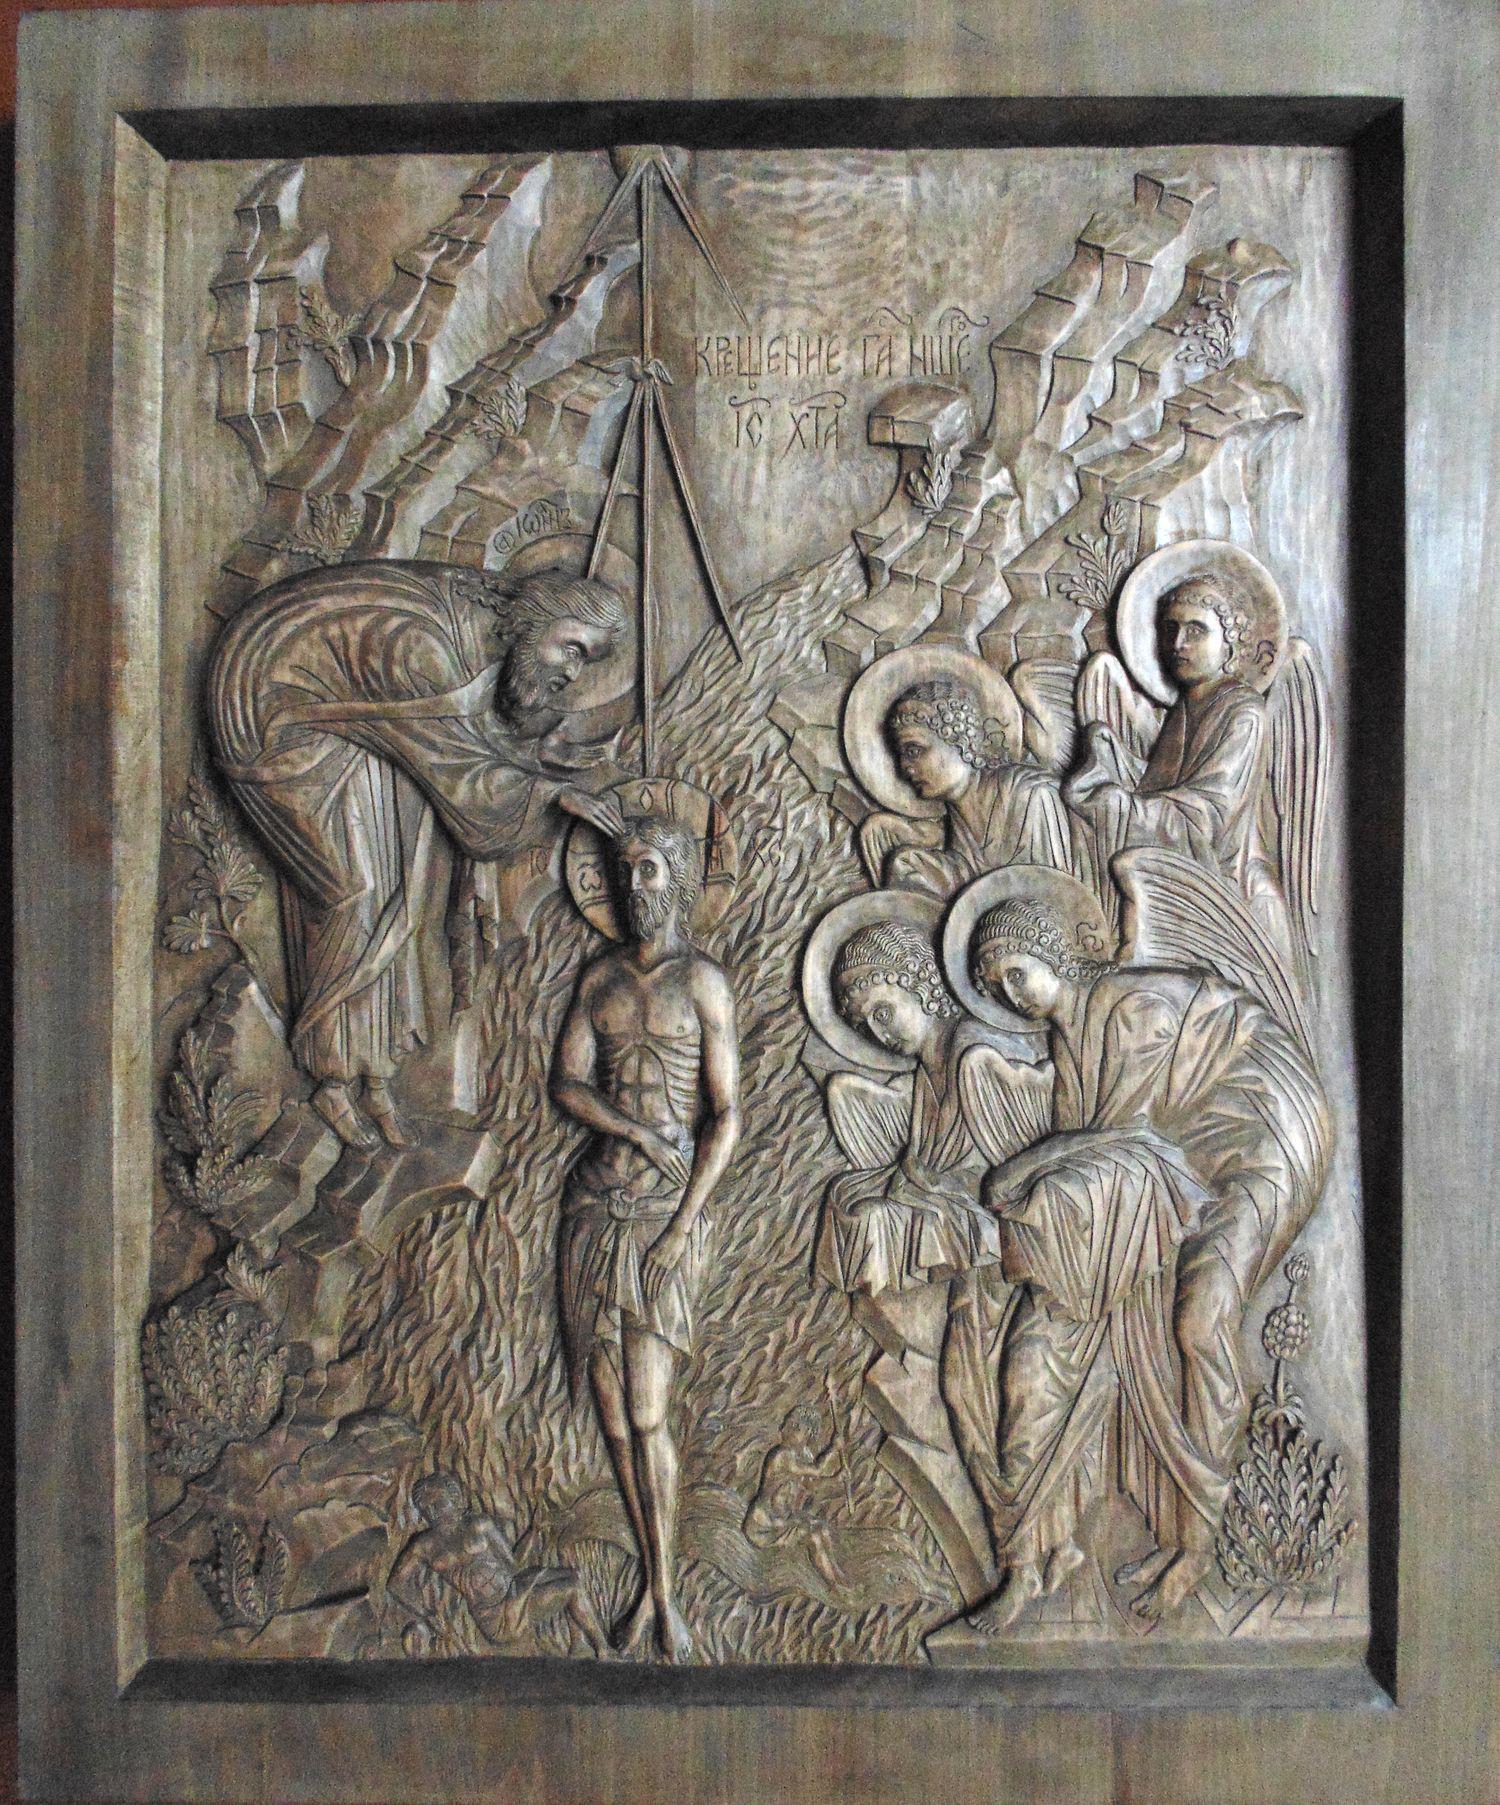 П.В.Алёшин. Крещение Господне. Дерево (липа), резьба. 50х60 см.